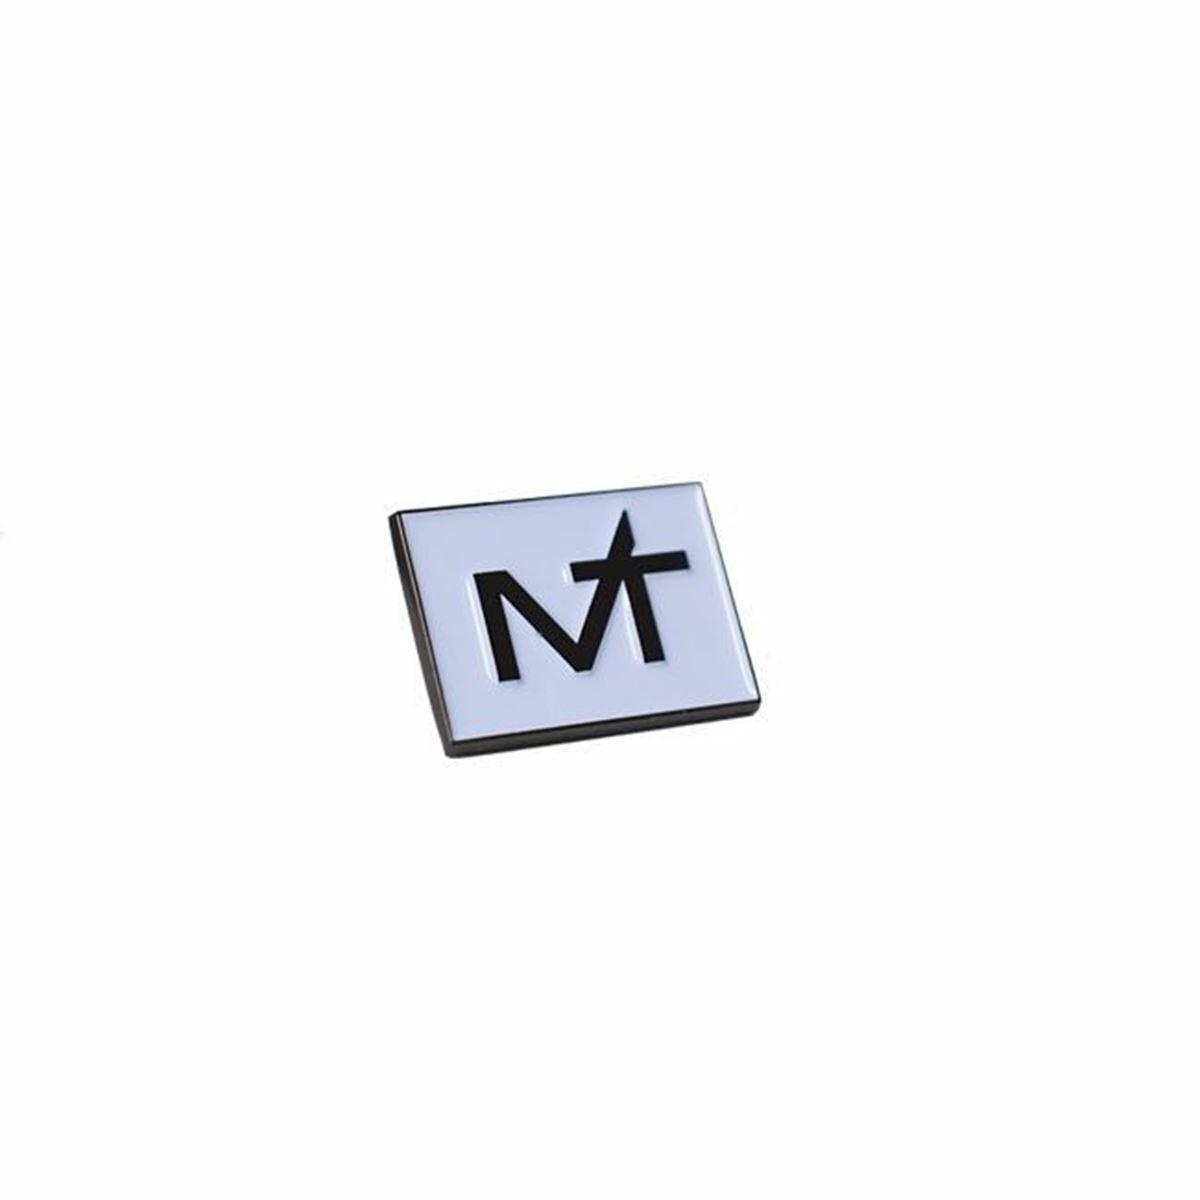 Picture of Matakki Scissor MT Pin Badge